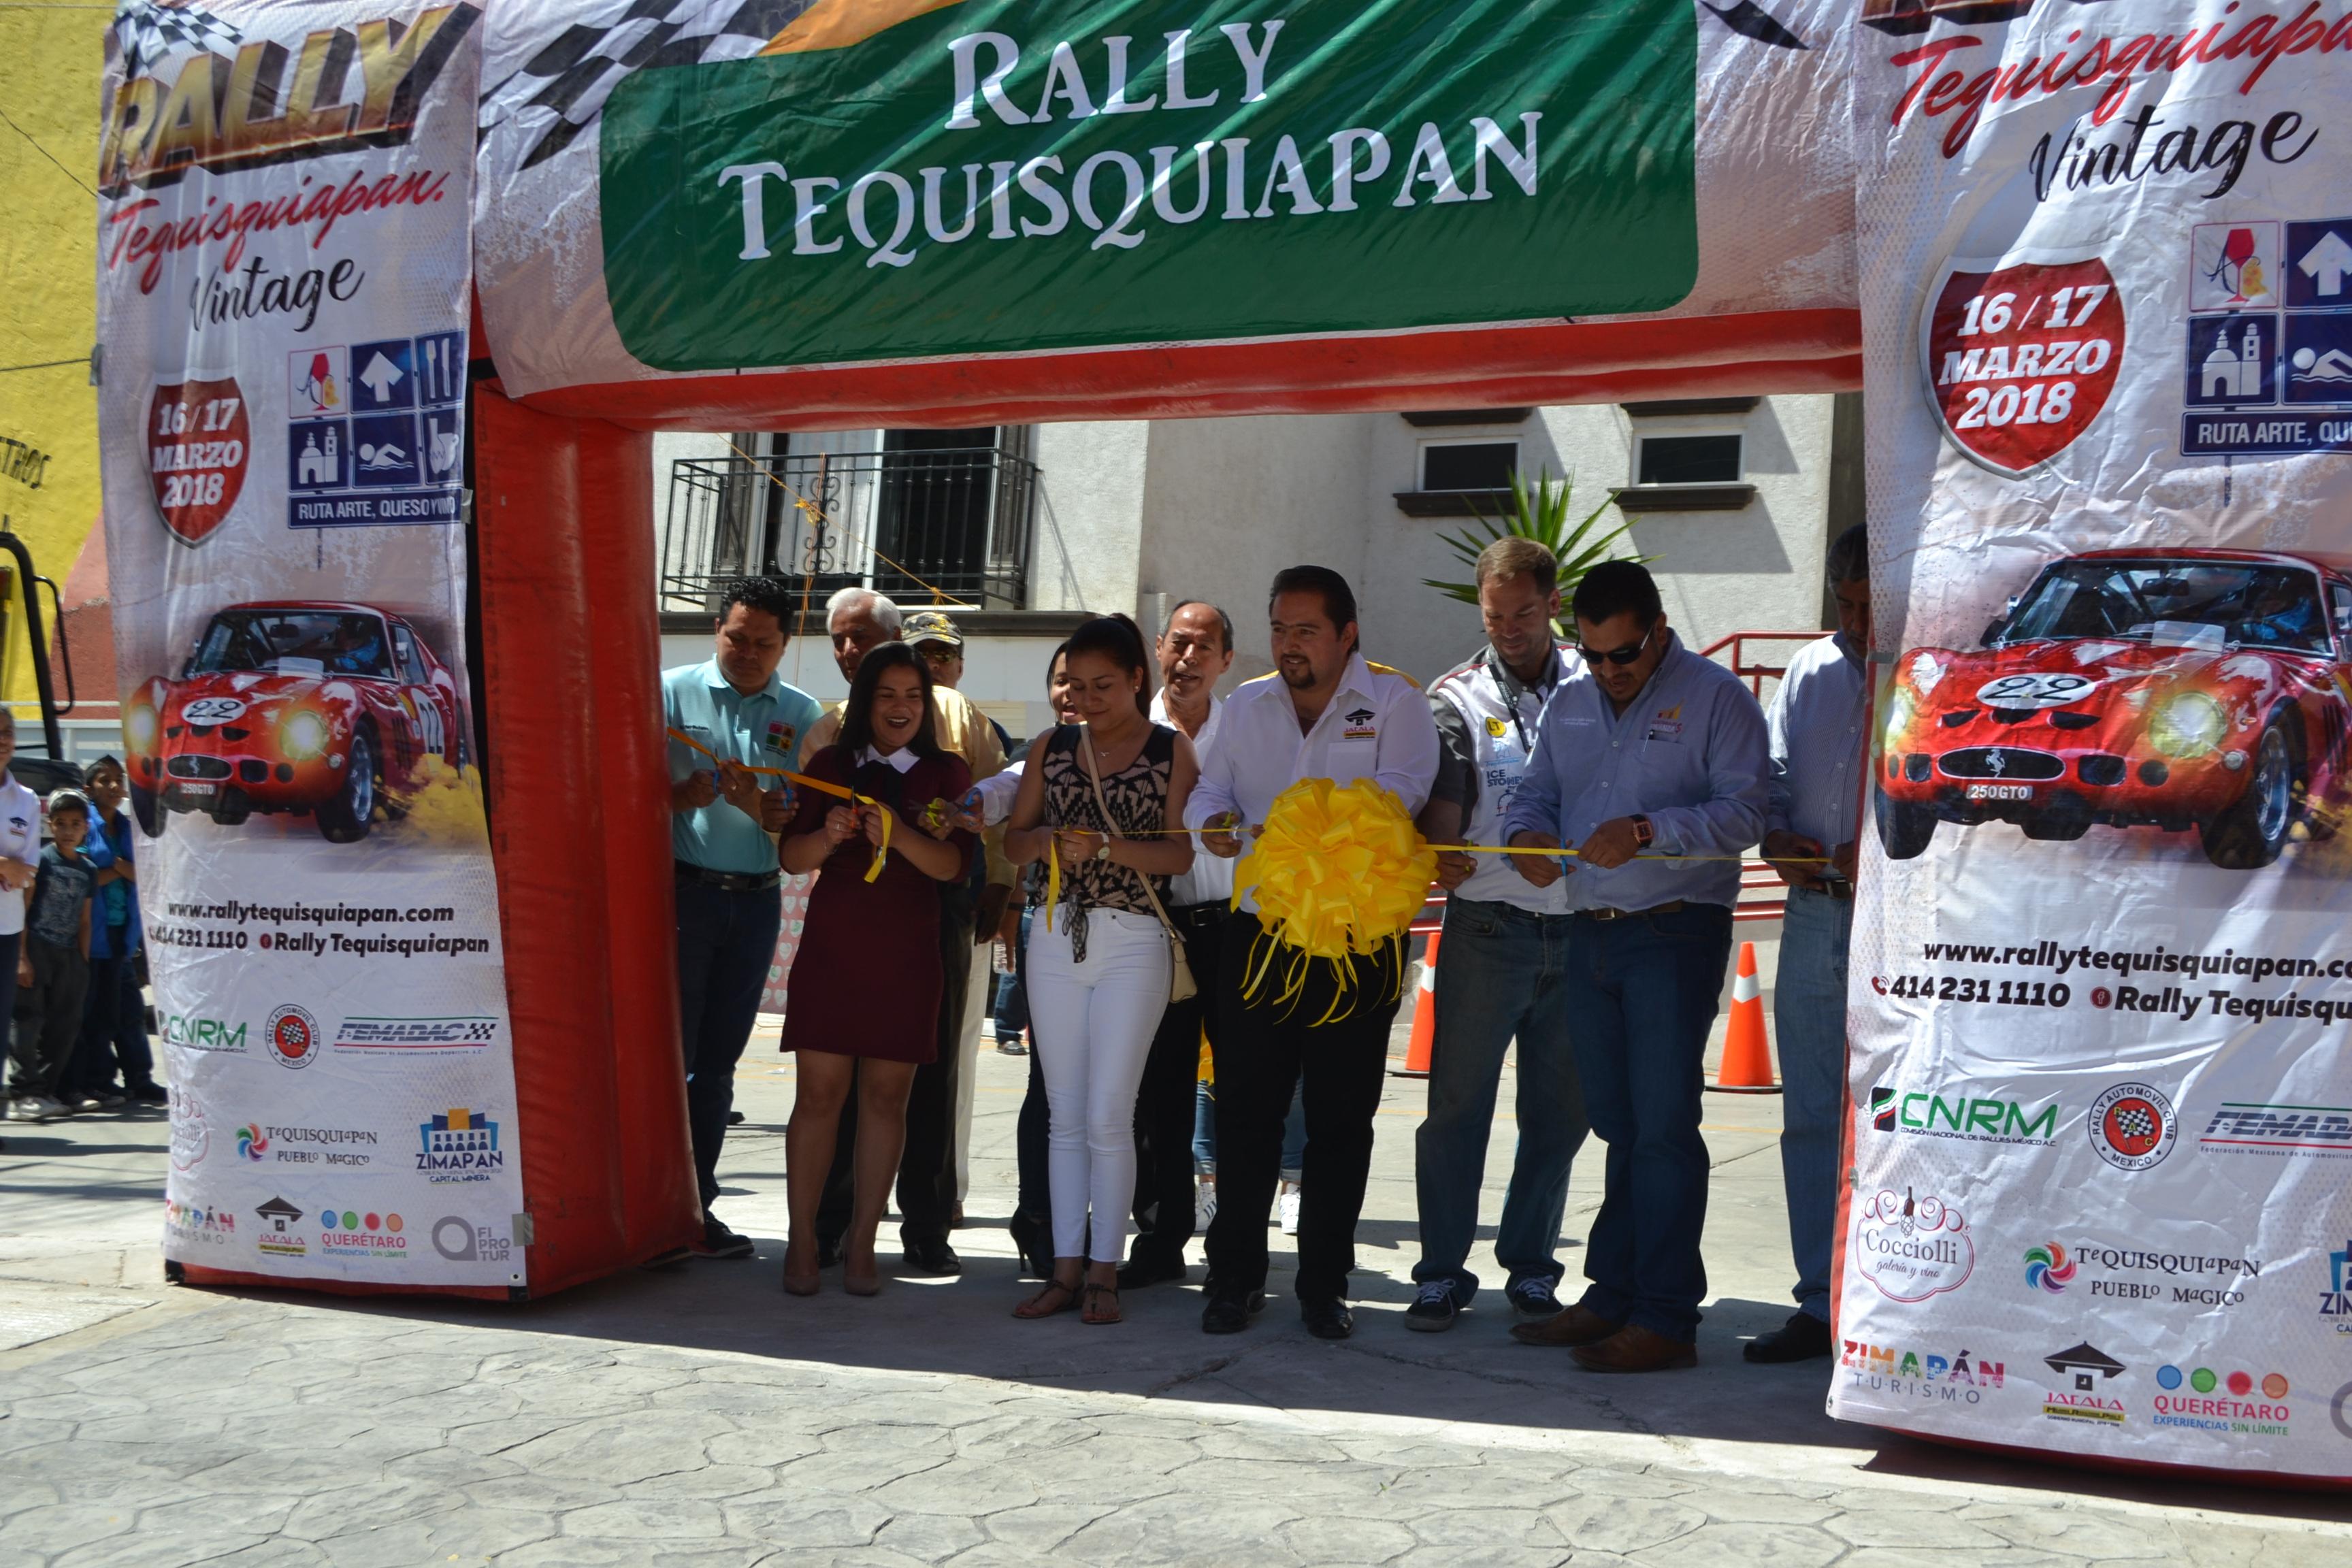 Rally Tequiasquiapan Vintage 2018 403